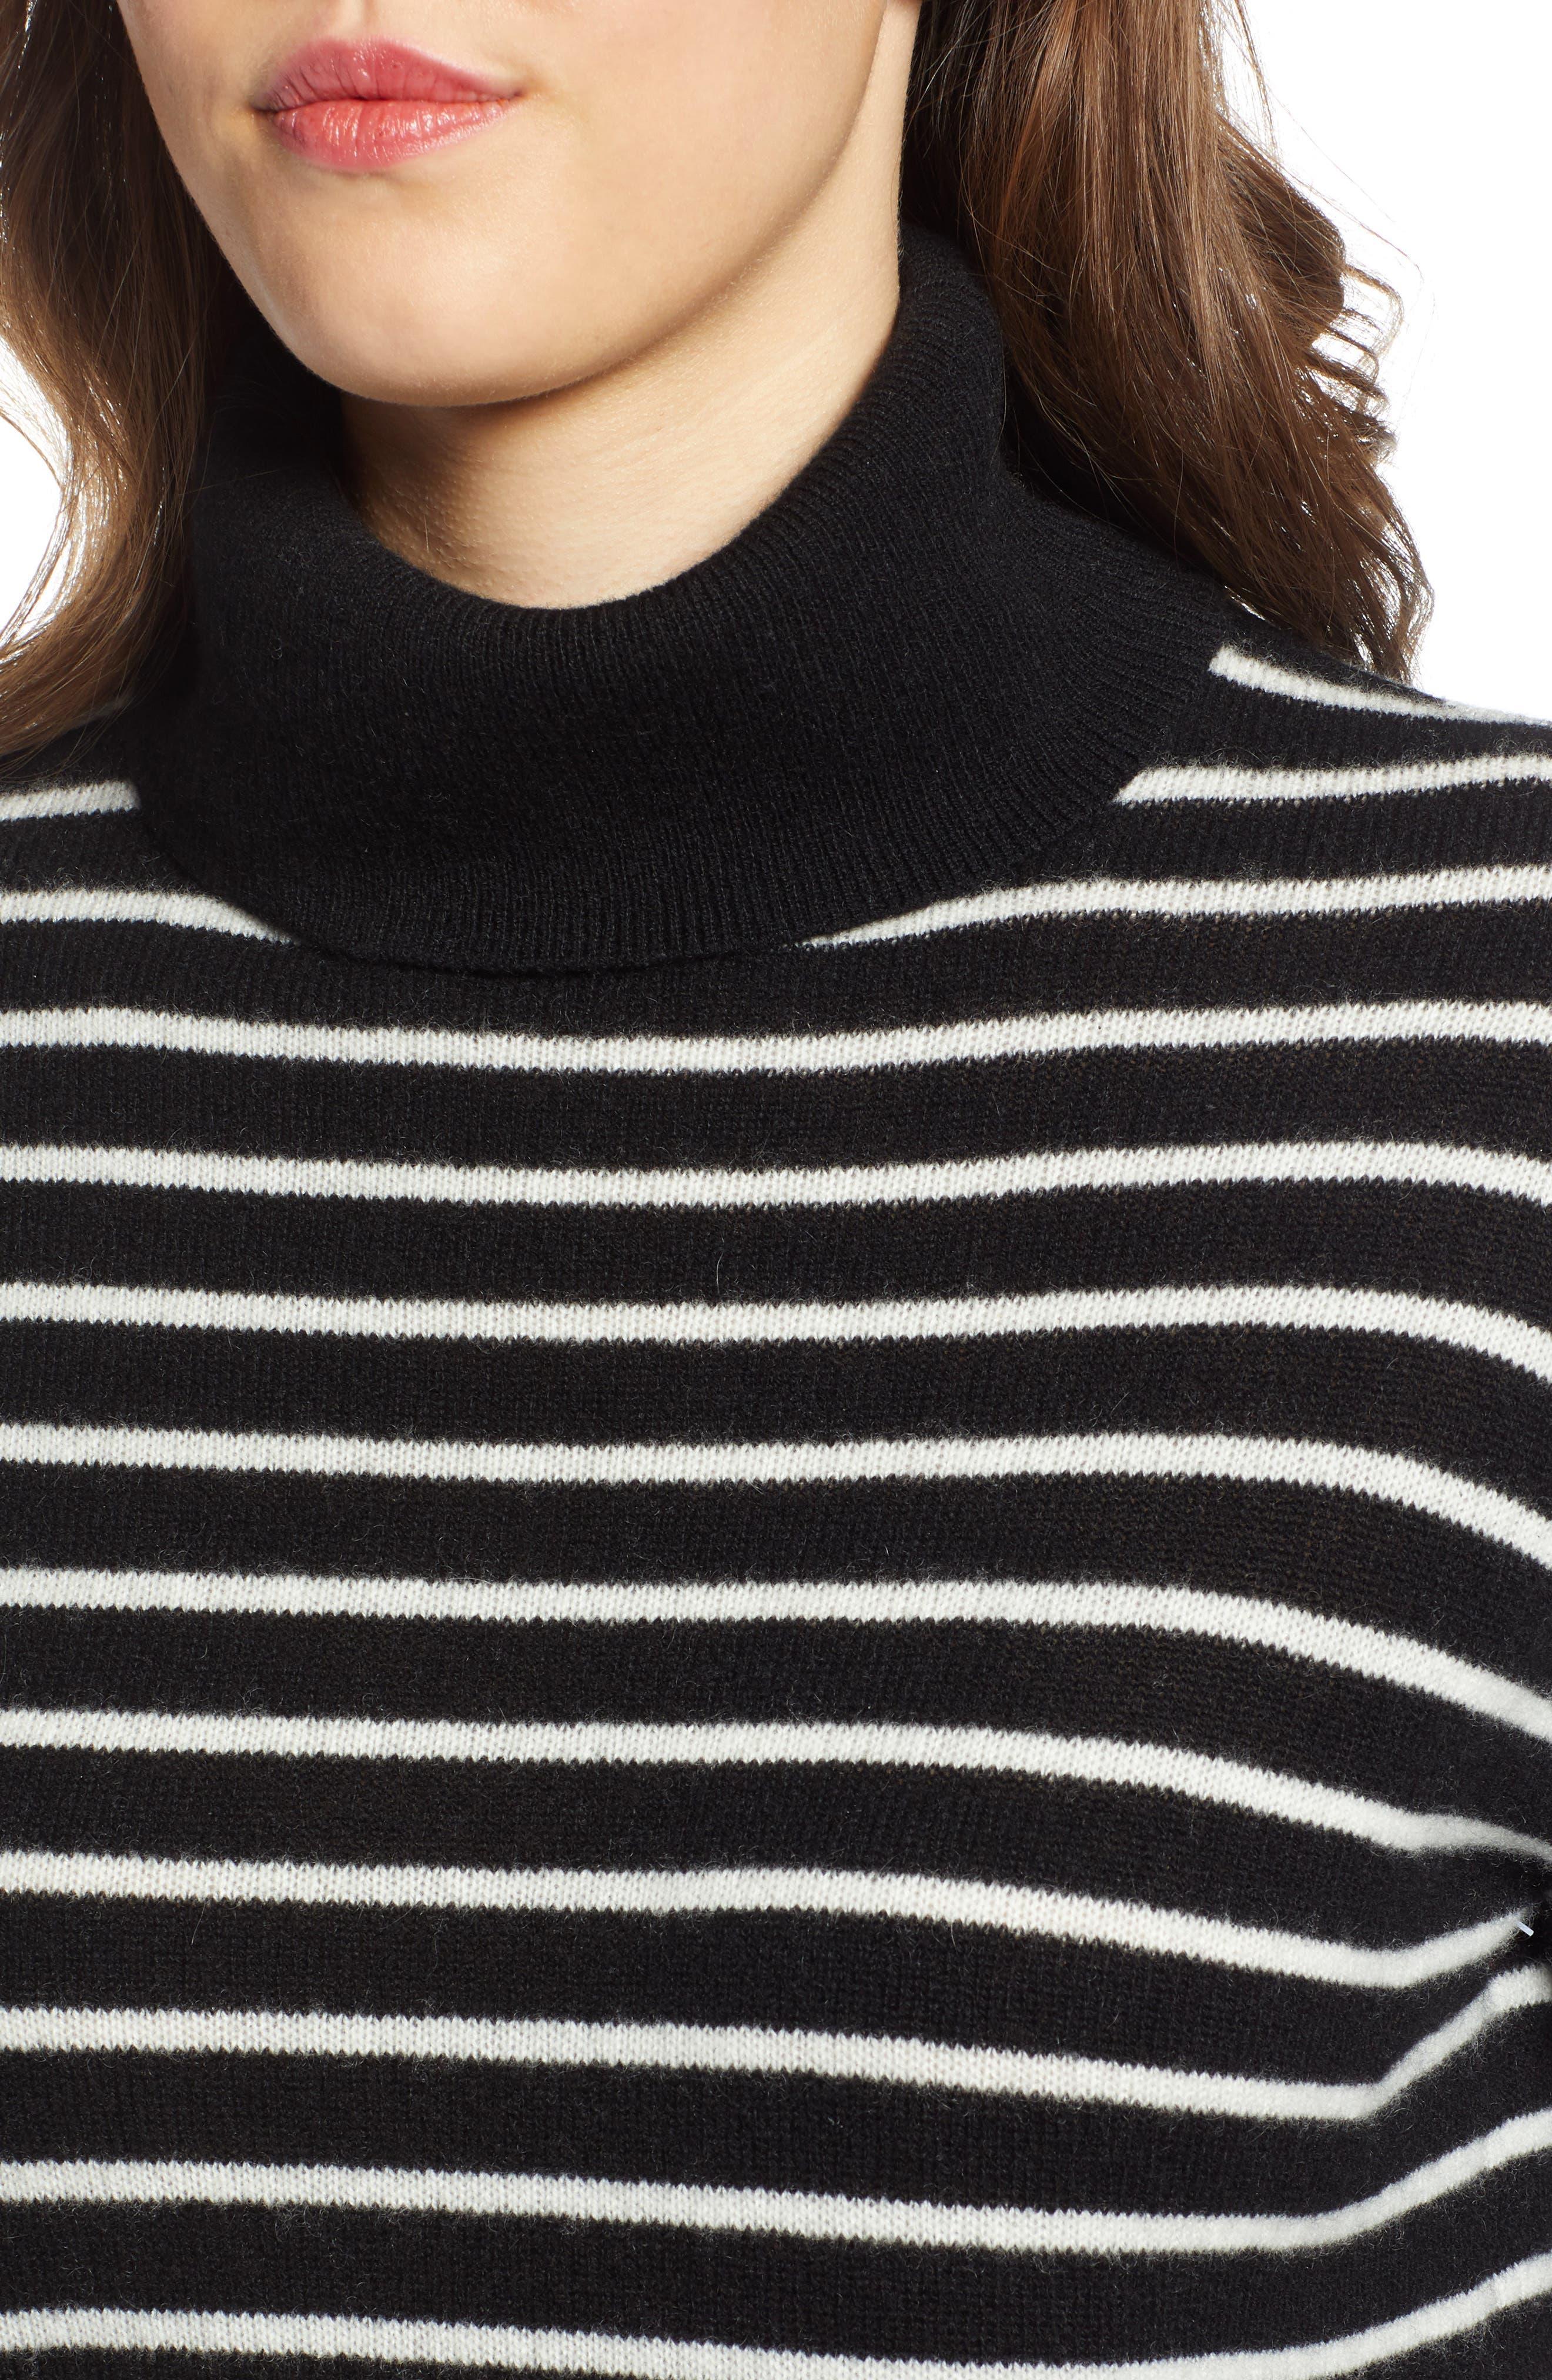 Cashmere Turtleneck Sweater,                             Alternate thumbnail 4, color,                             BLACK- IVORY STRIPE